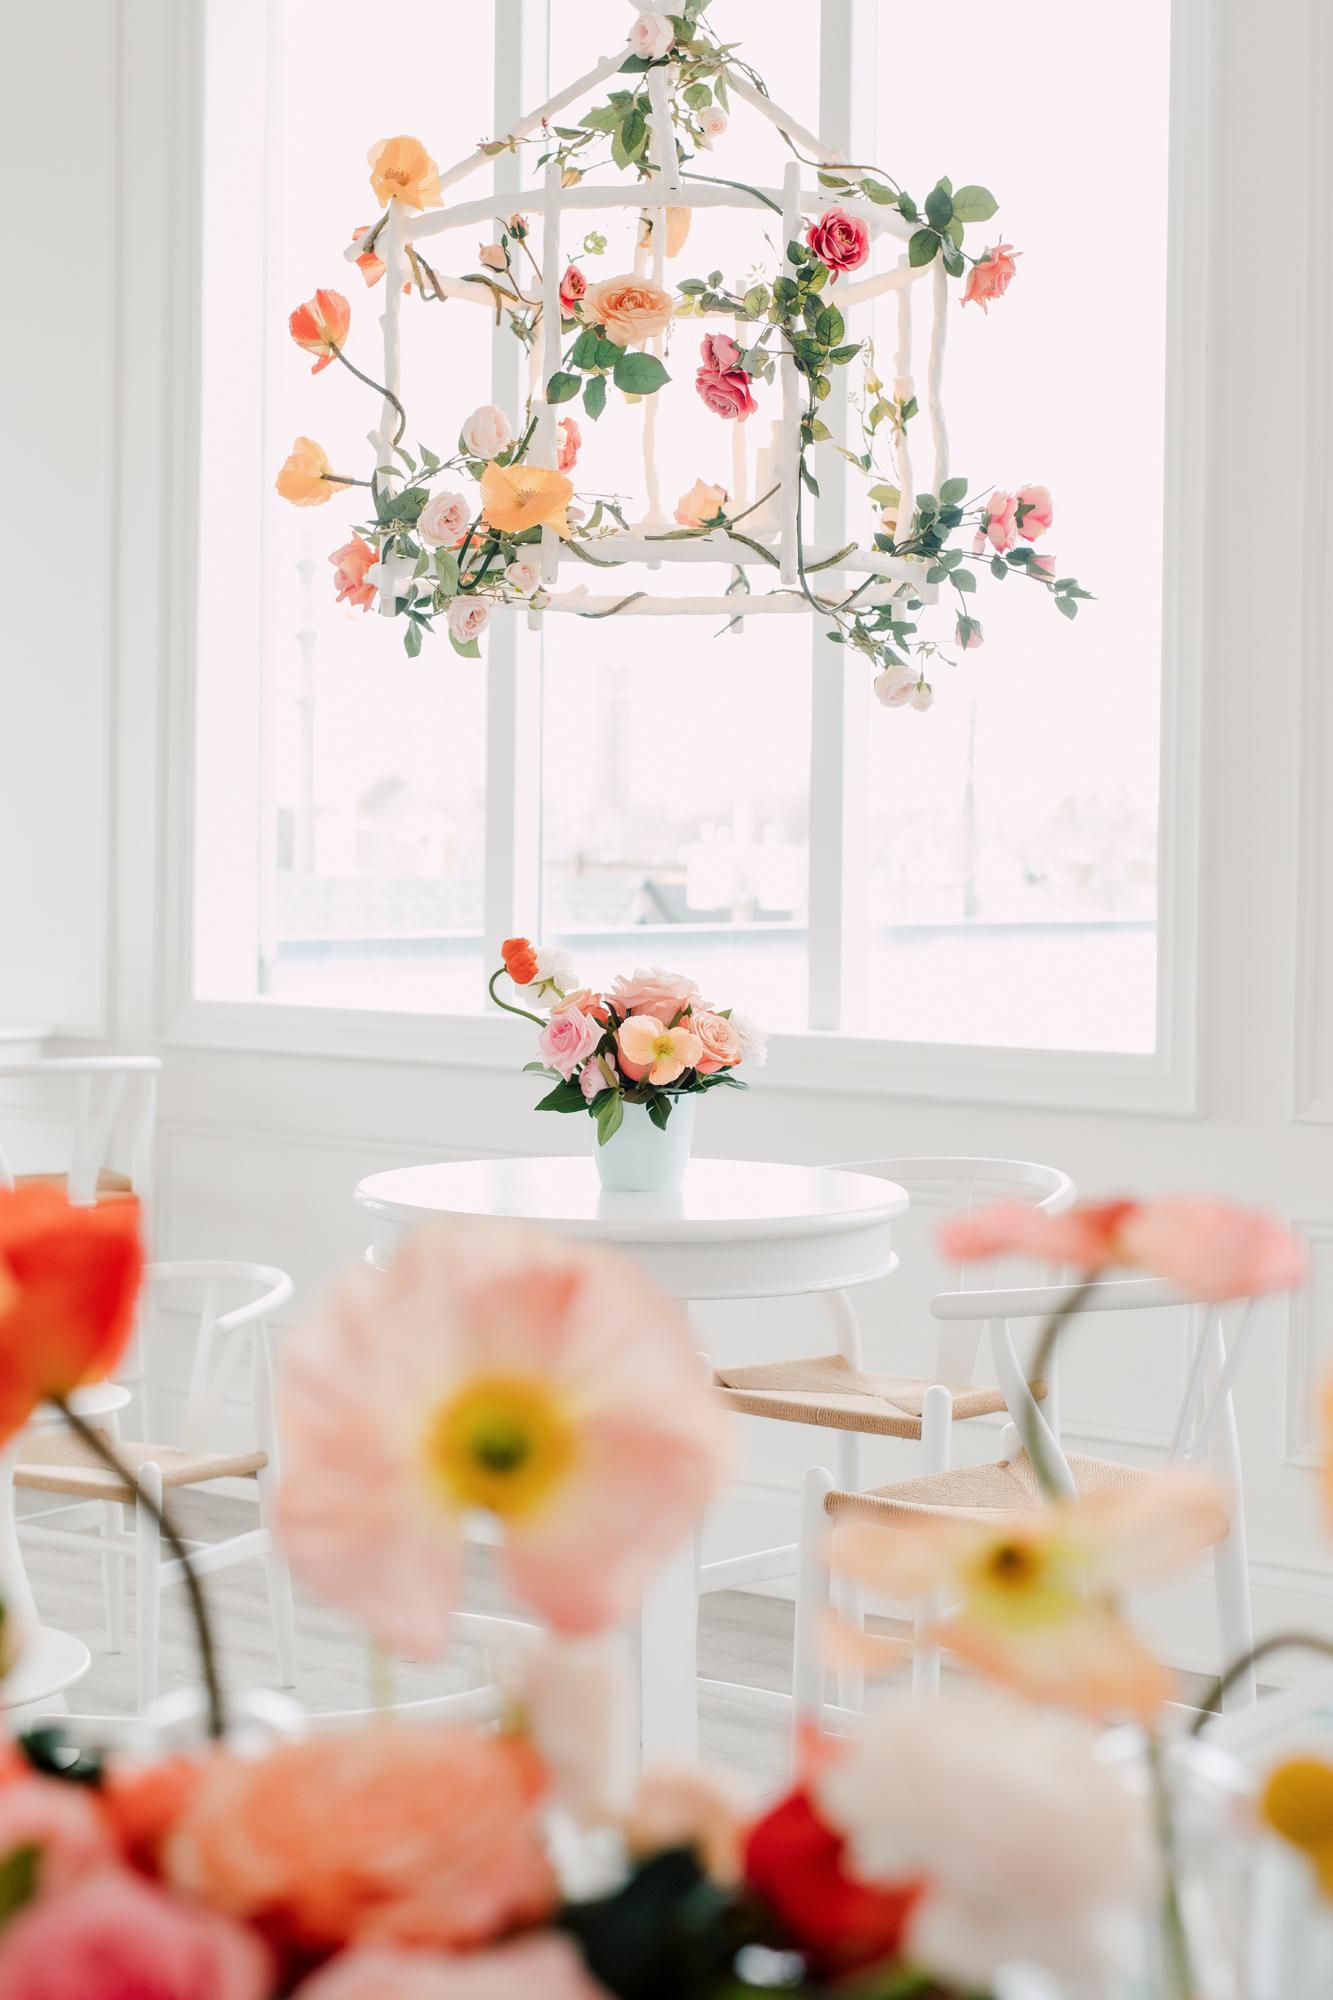 rachel clingen spring floral